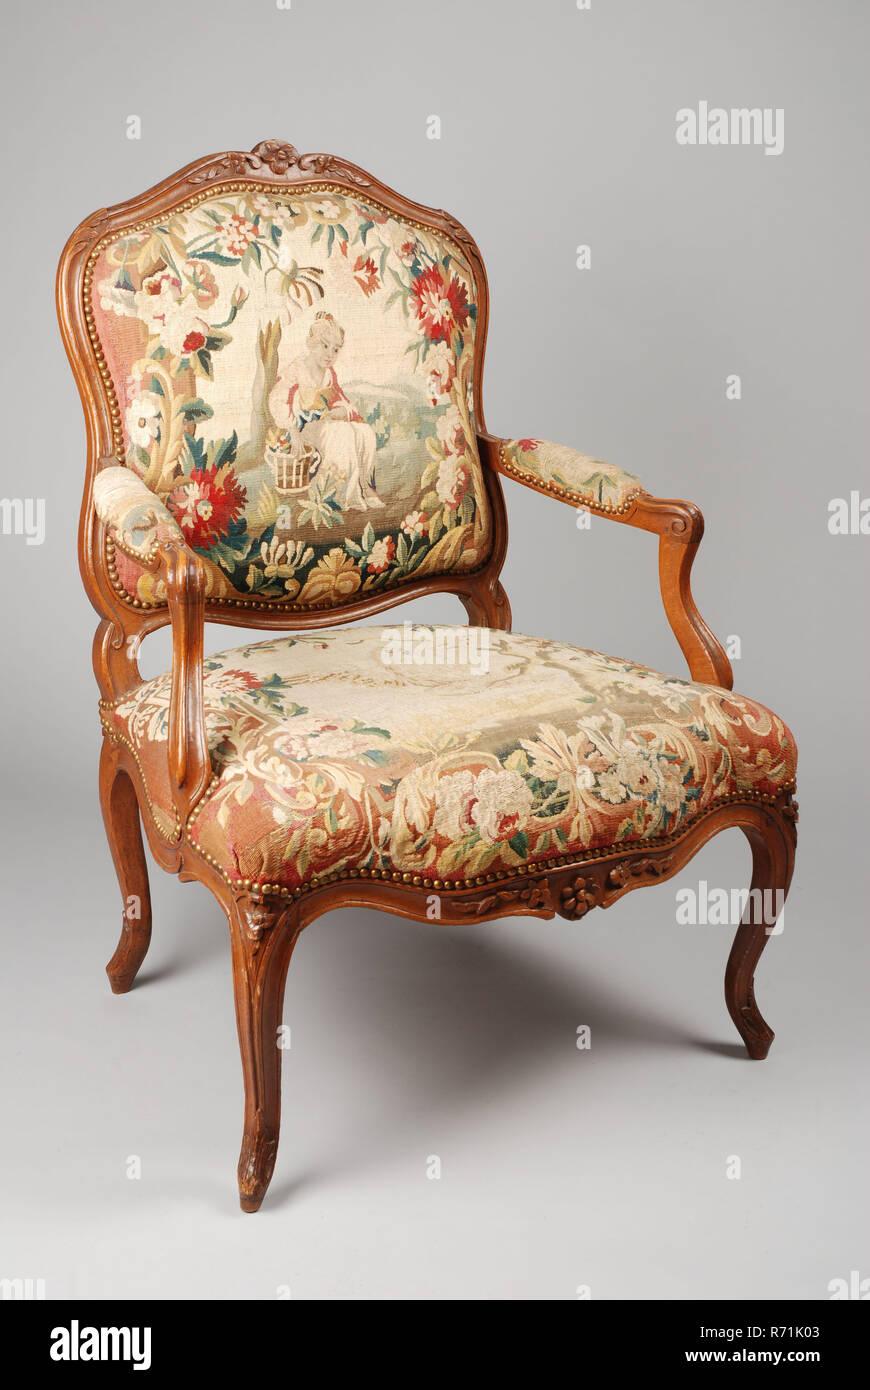 Buchenholz Rokoko Sessel Sessel Sessel Stuhl Sitz Möbel